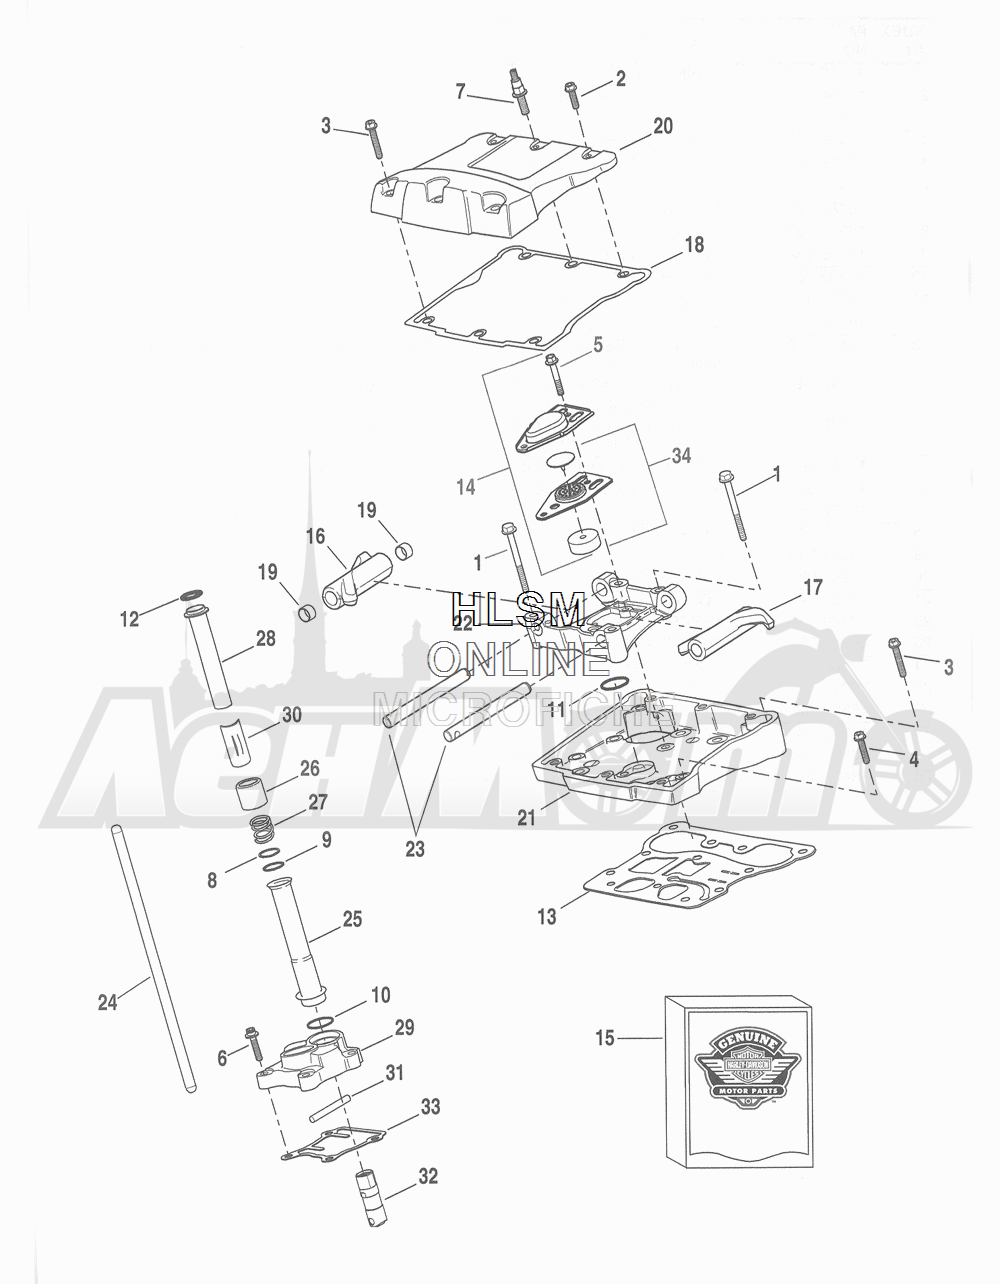 Запчасти для Мотоцикла Harley-Davidson 2016 FLHRC ROAD KING CLASSIC (FRM) Раздел: ROCKER ARM ASSEMBLY W/ PUSHRODS | коромысло (рокер) клапана в сборе вместе с толкатели